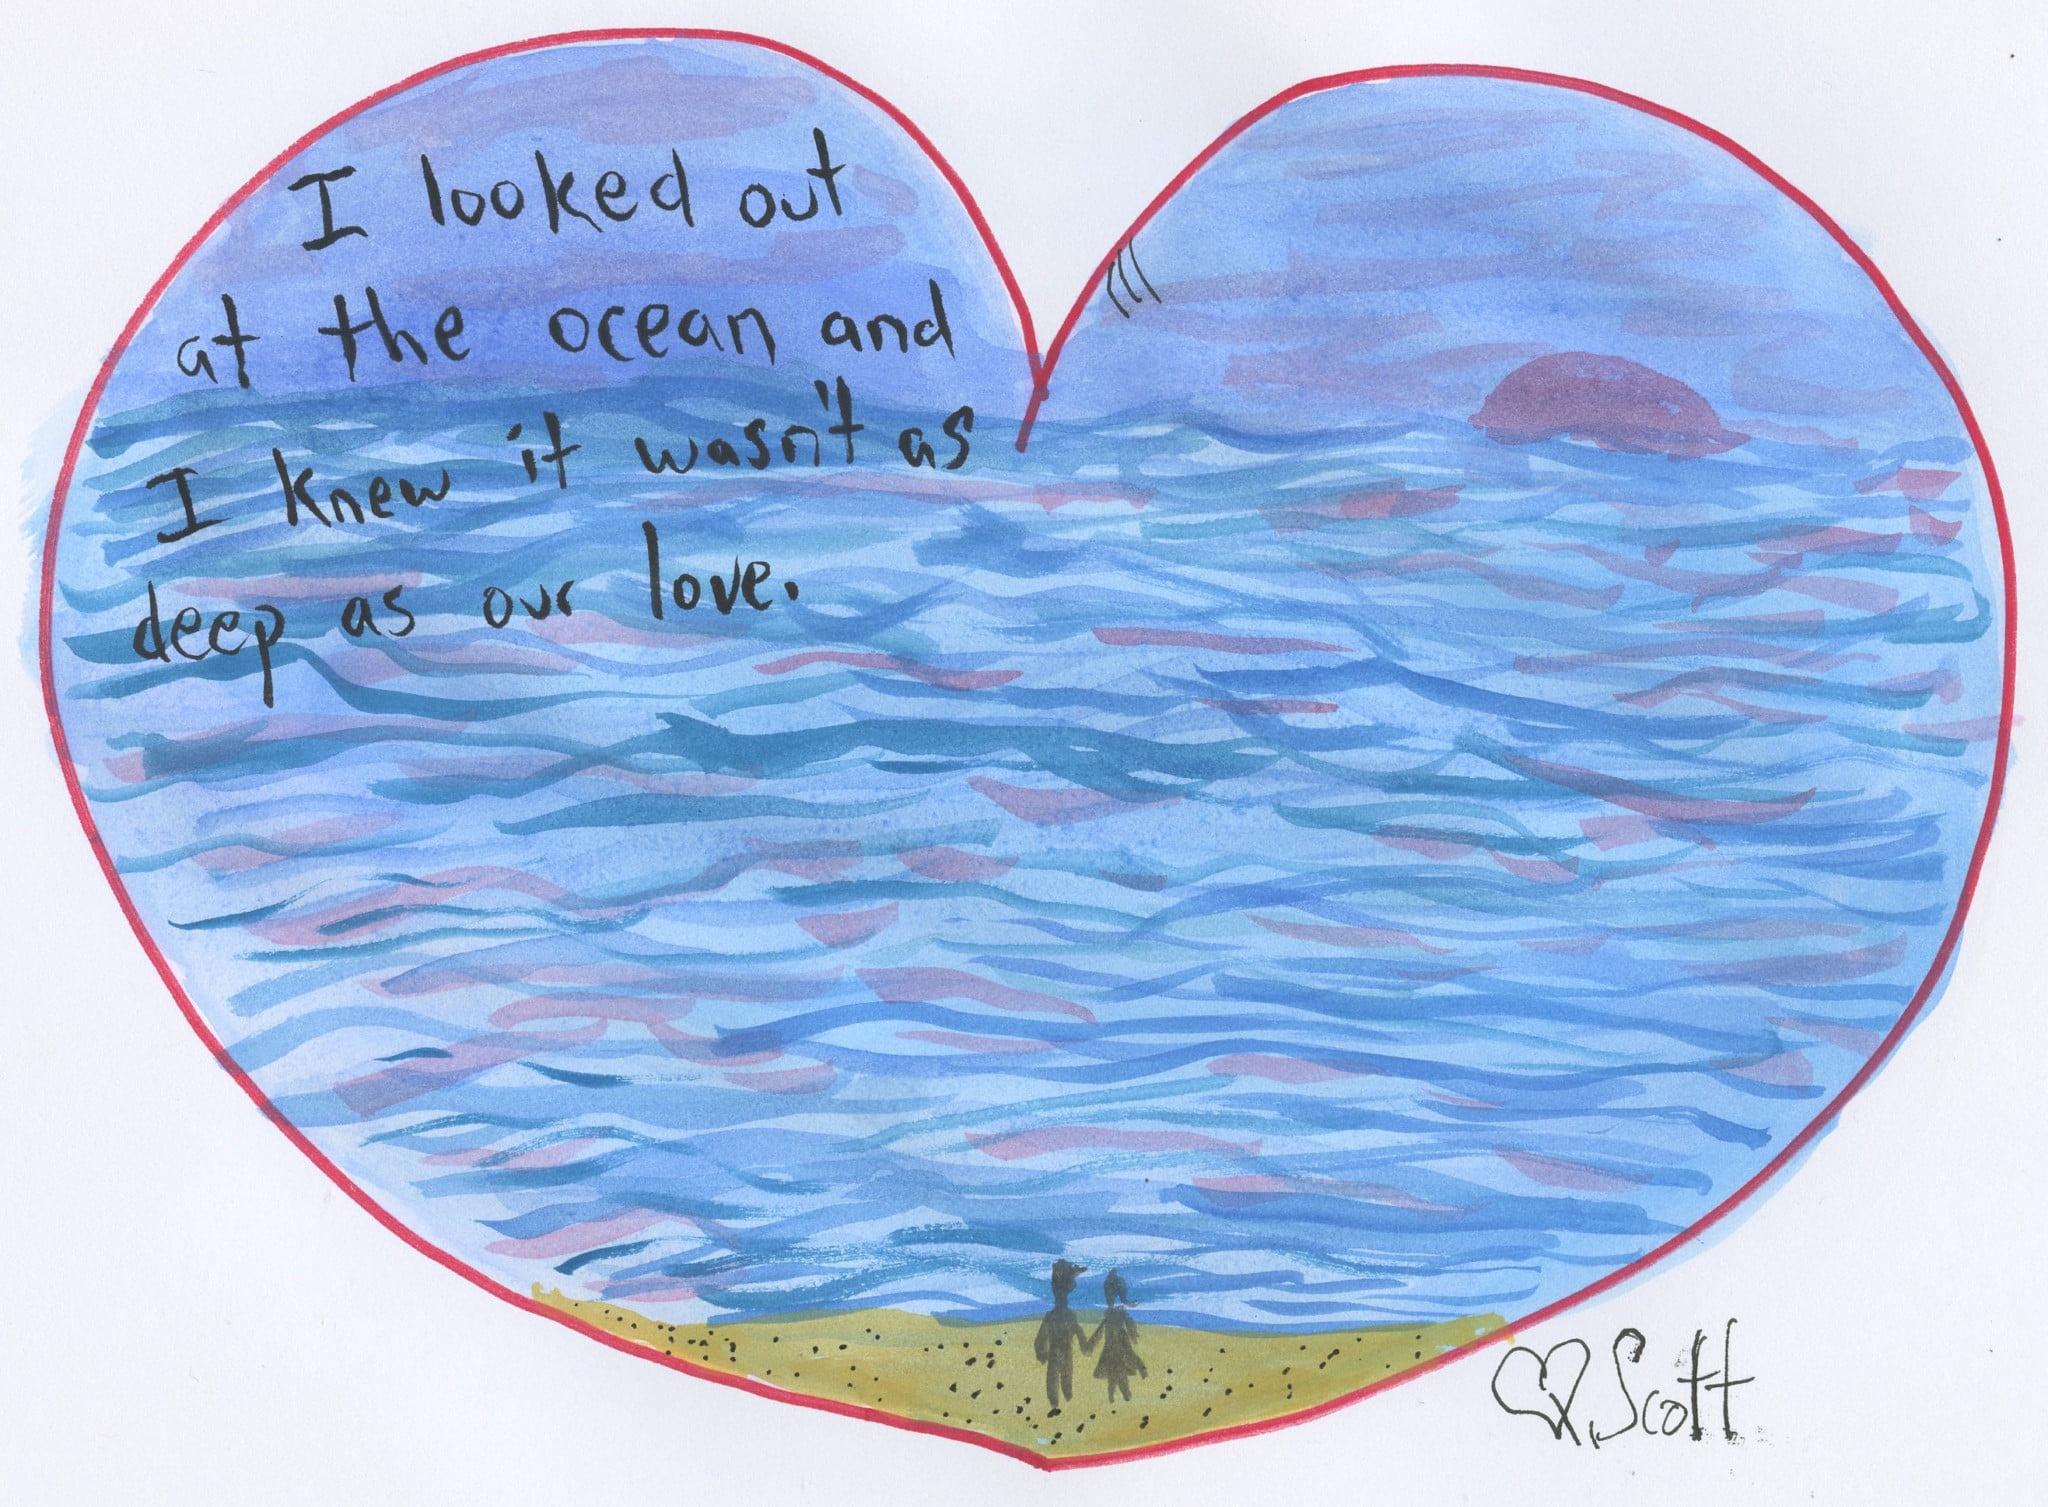 Deep in the Heart by Sharon Sala (2007)Pb